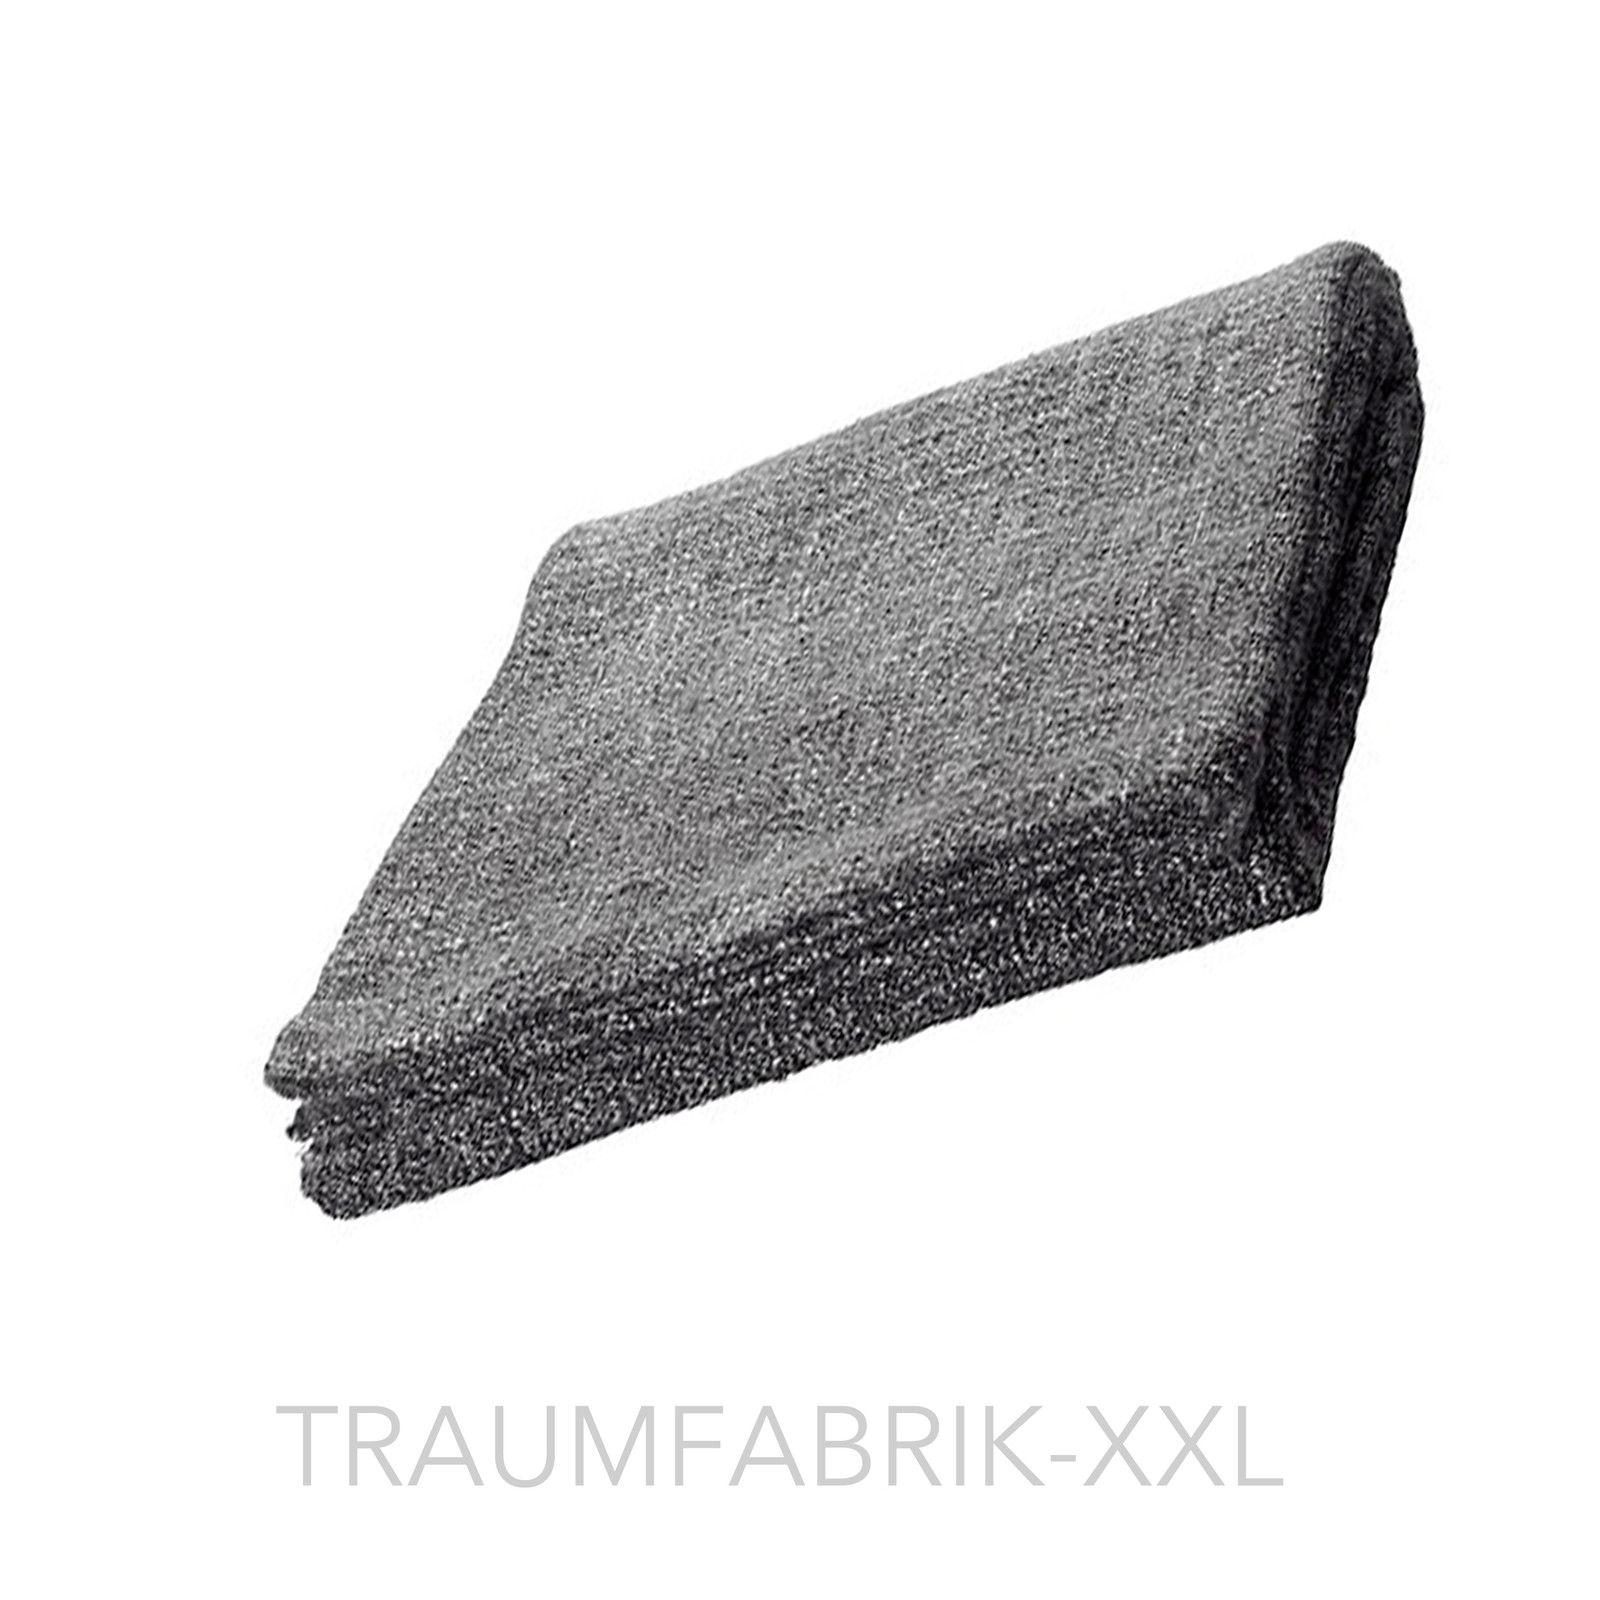 tagesdecke 120 180 cm decke kuscheldecke plaid berwurf wolldecke grau schwarz traumfabrik xxl. Black Bedroom Furniture Sets. Home Design Ideas